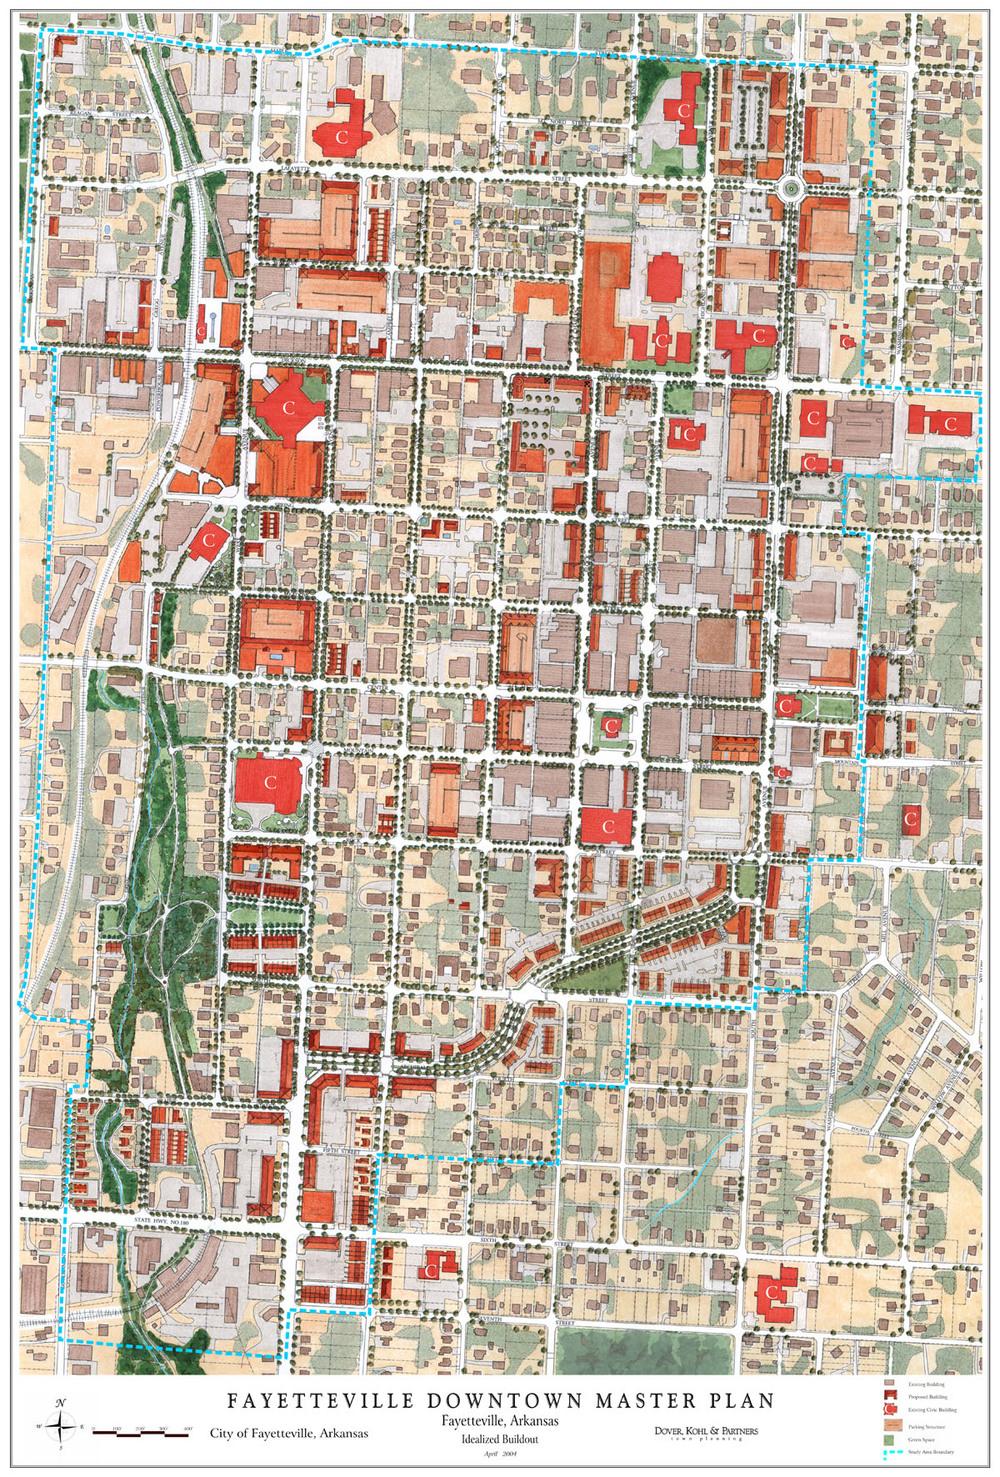 Fayetteville Illustrative Masterplan.jpg